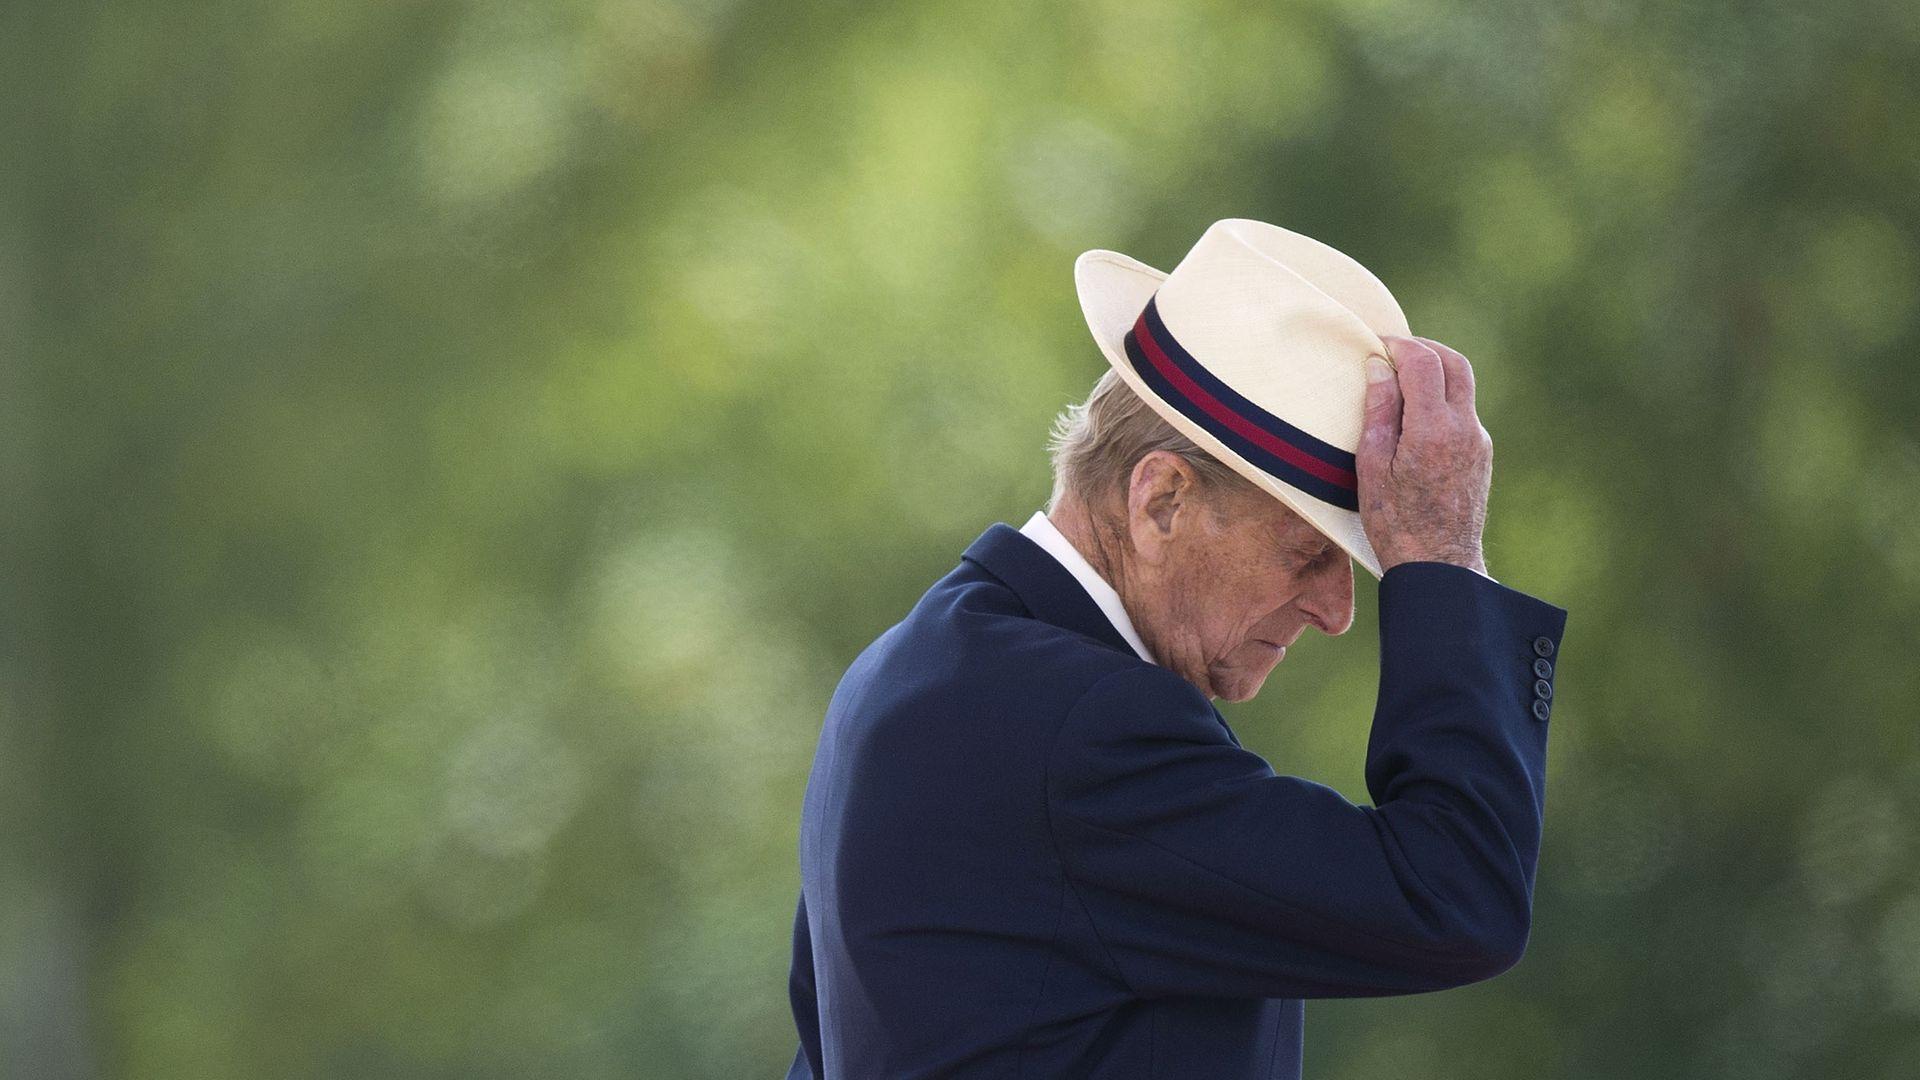 Prince Philip, Duke of Edinburgh in Fallingbostel, Germany, in 2014 - Credit: Getty Images